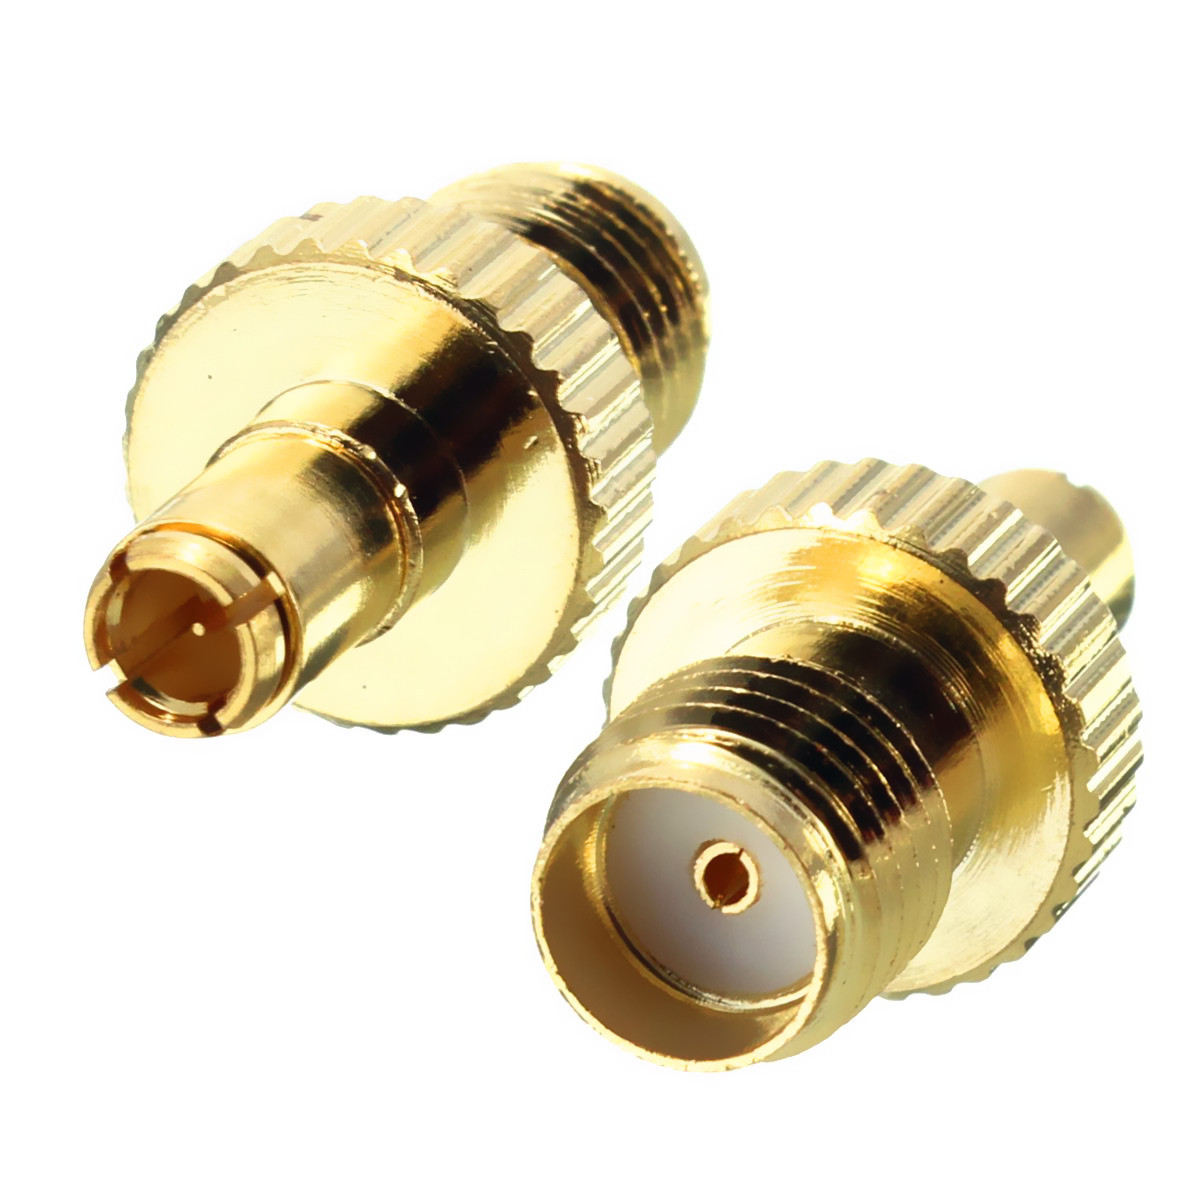 antenna adapter ts9 male plug to sma female jack rf. Black Bedroom Furniture Sets. Home Design Ideas